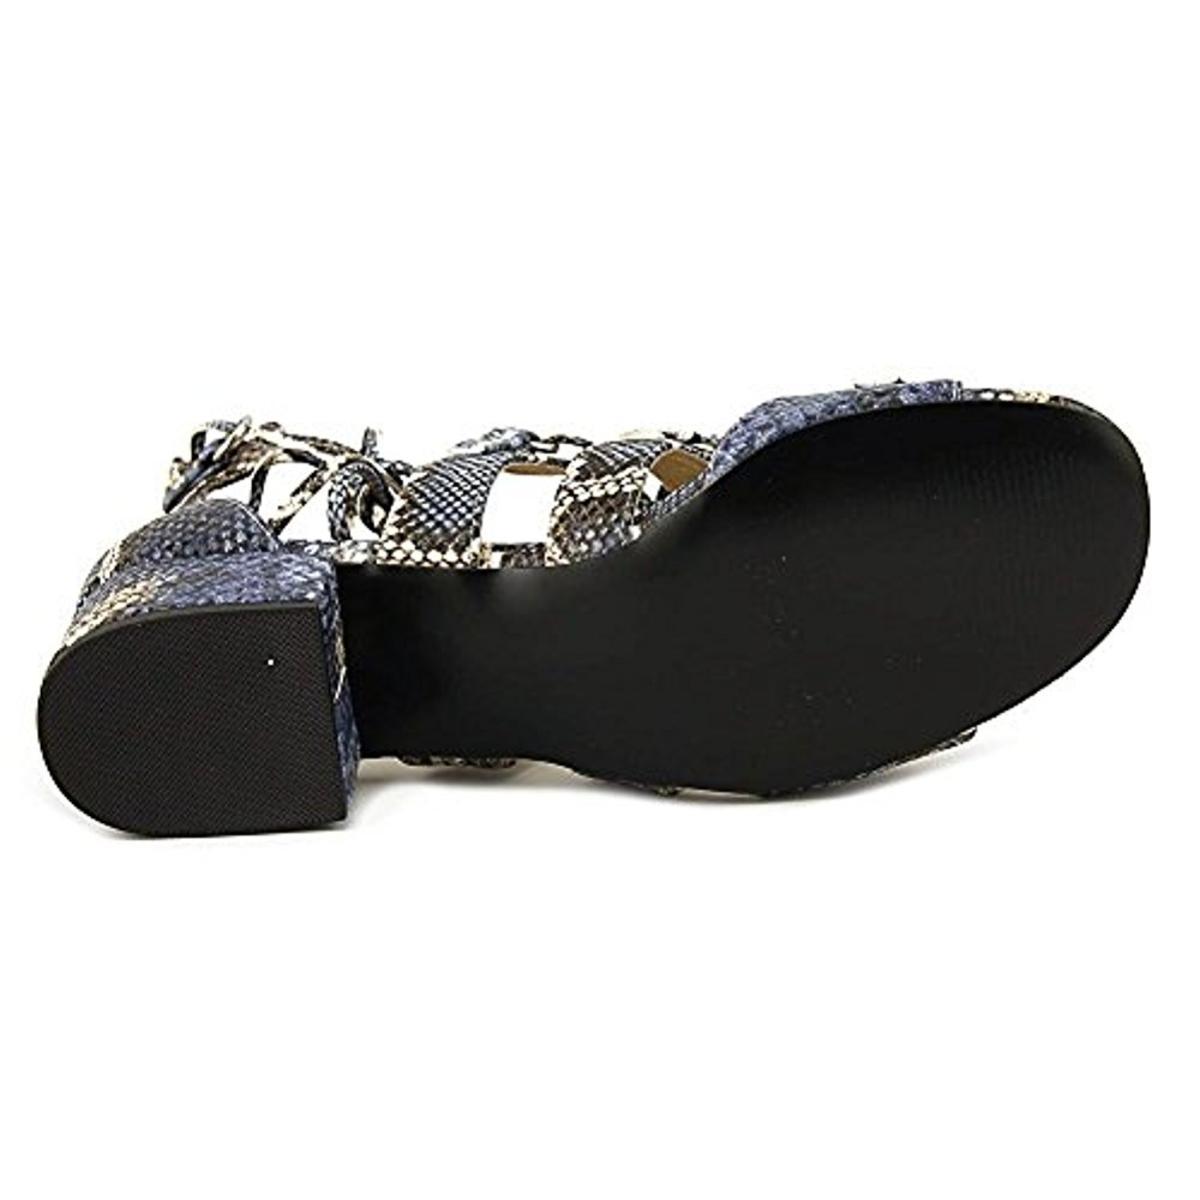 Design-Lab-Womens-Eldy-Block-Heel-Dress-Sandals-Shoes-BHFO-2676 thumbnail 12